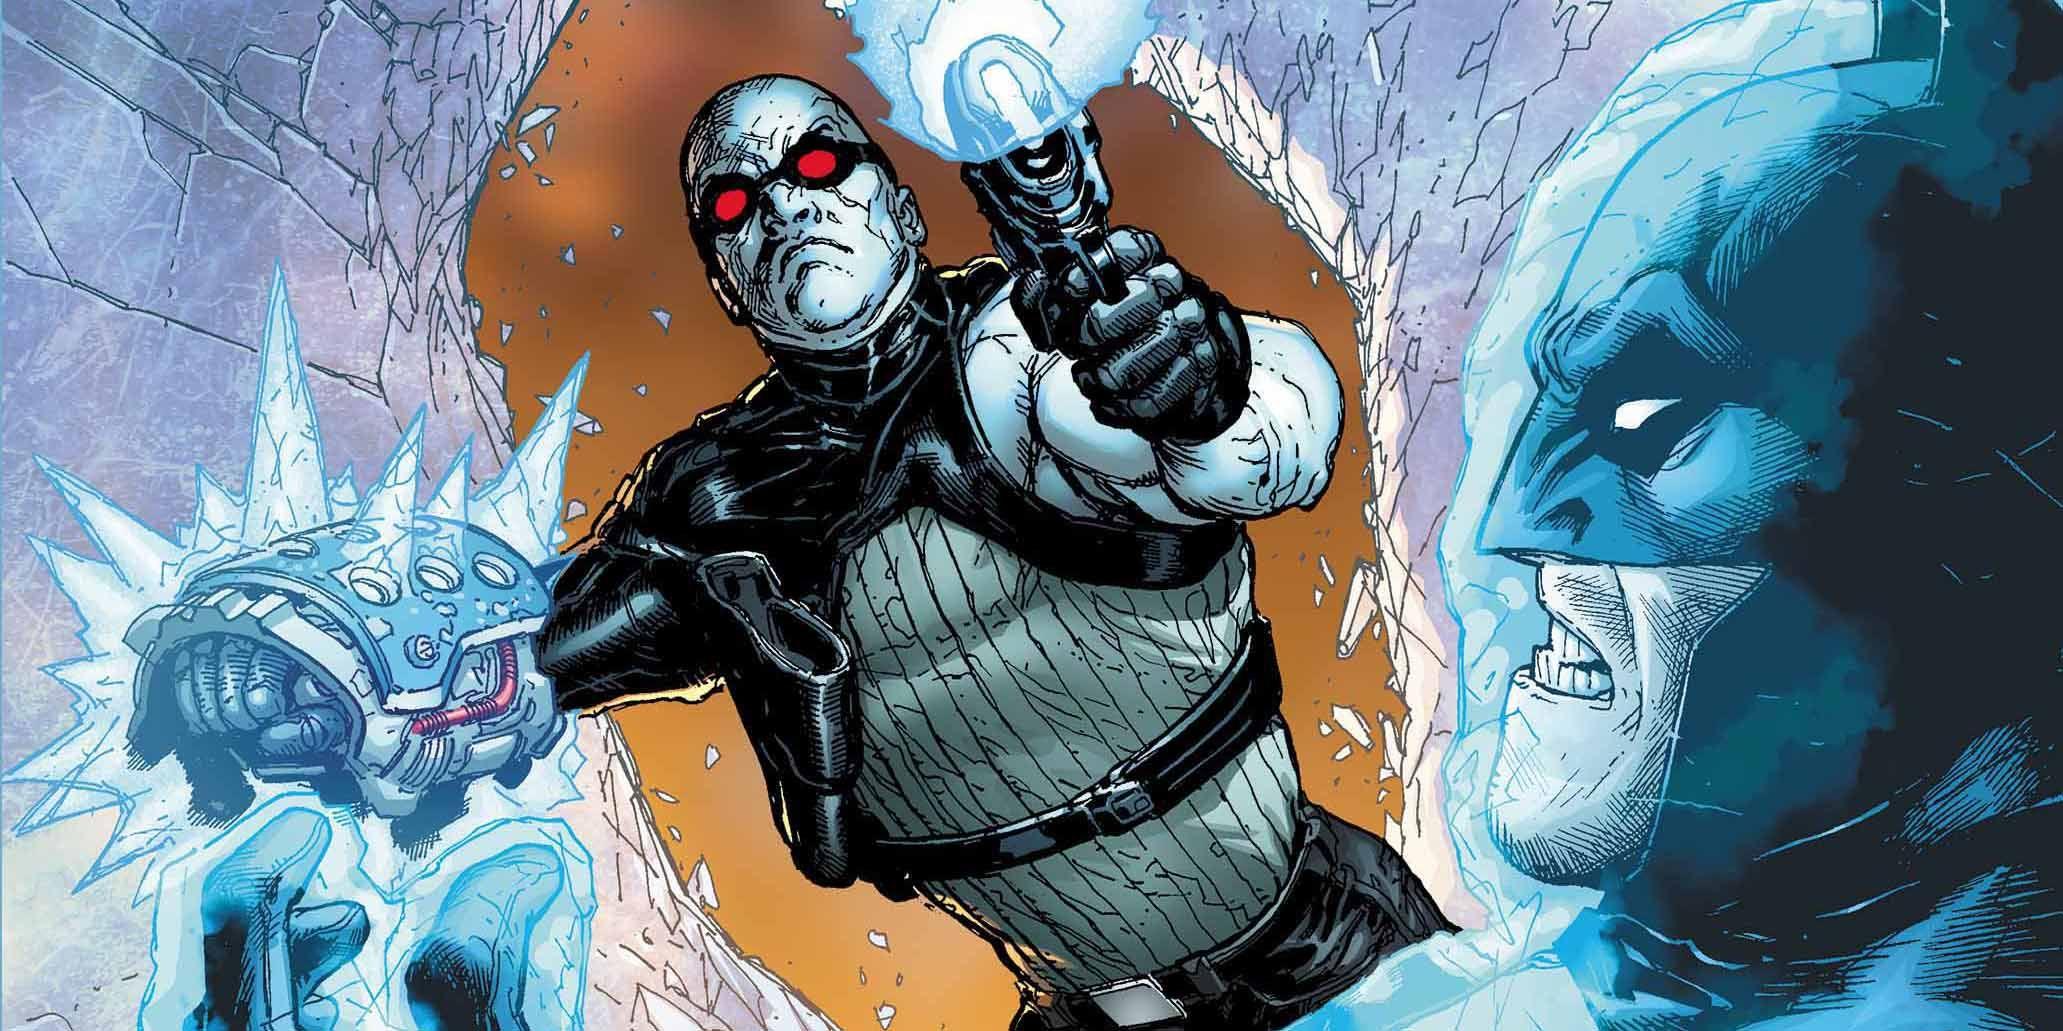 EXCLUSIVE: Batman's War on Crime Gets Bloody in Detective Comics #1009